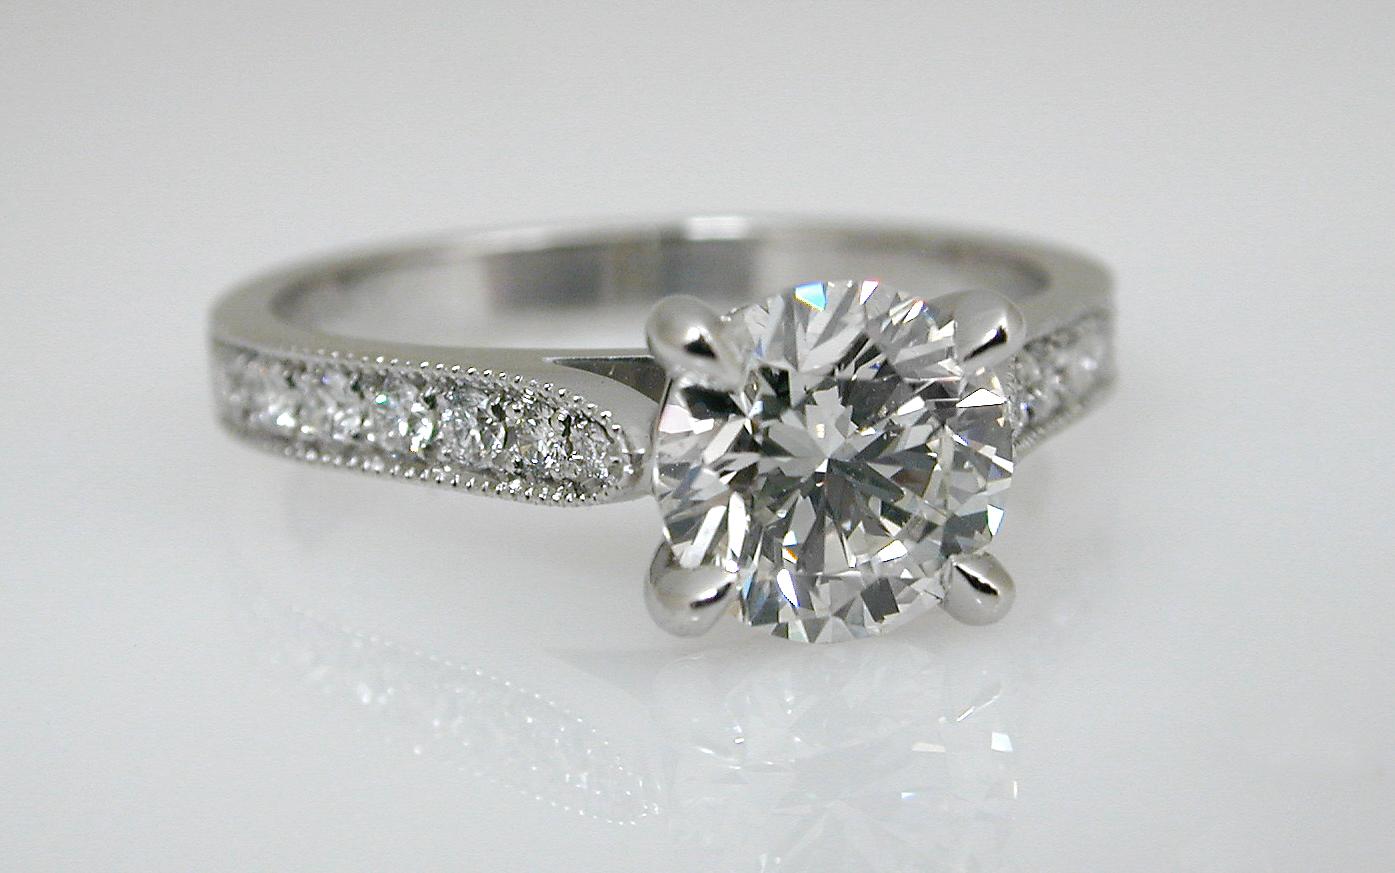 Hand Fabricated Platinum 1 carat with Bead Set Diamonds in Band